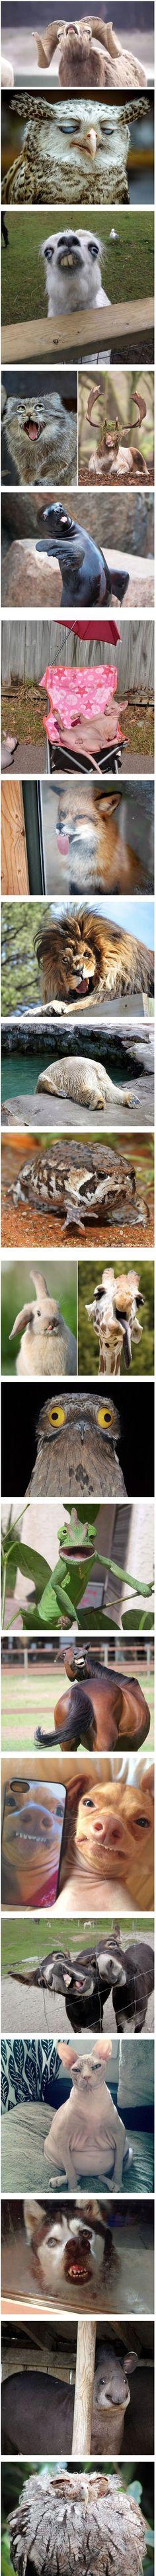 Extremely unphotogenic animals